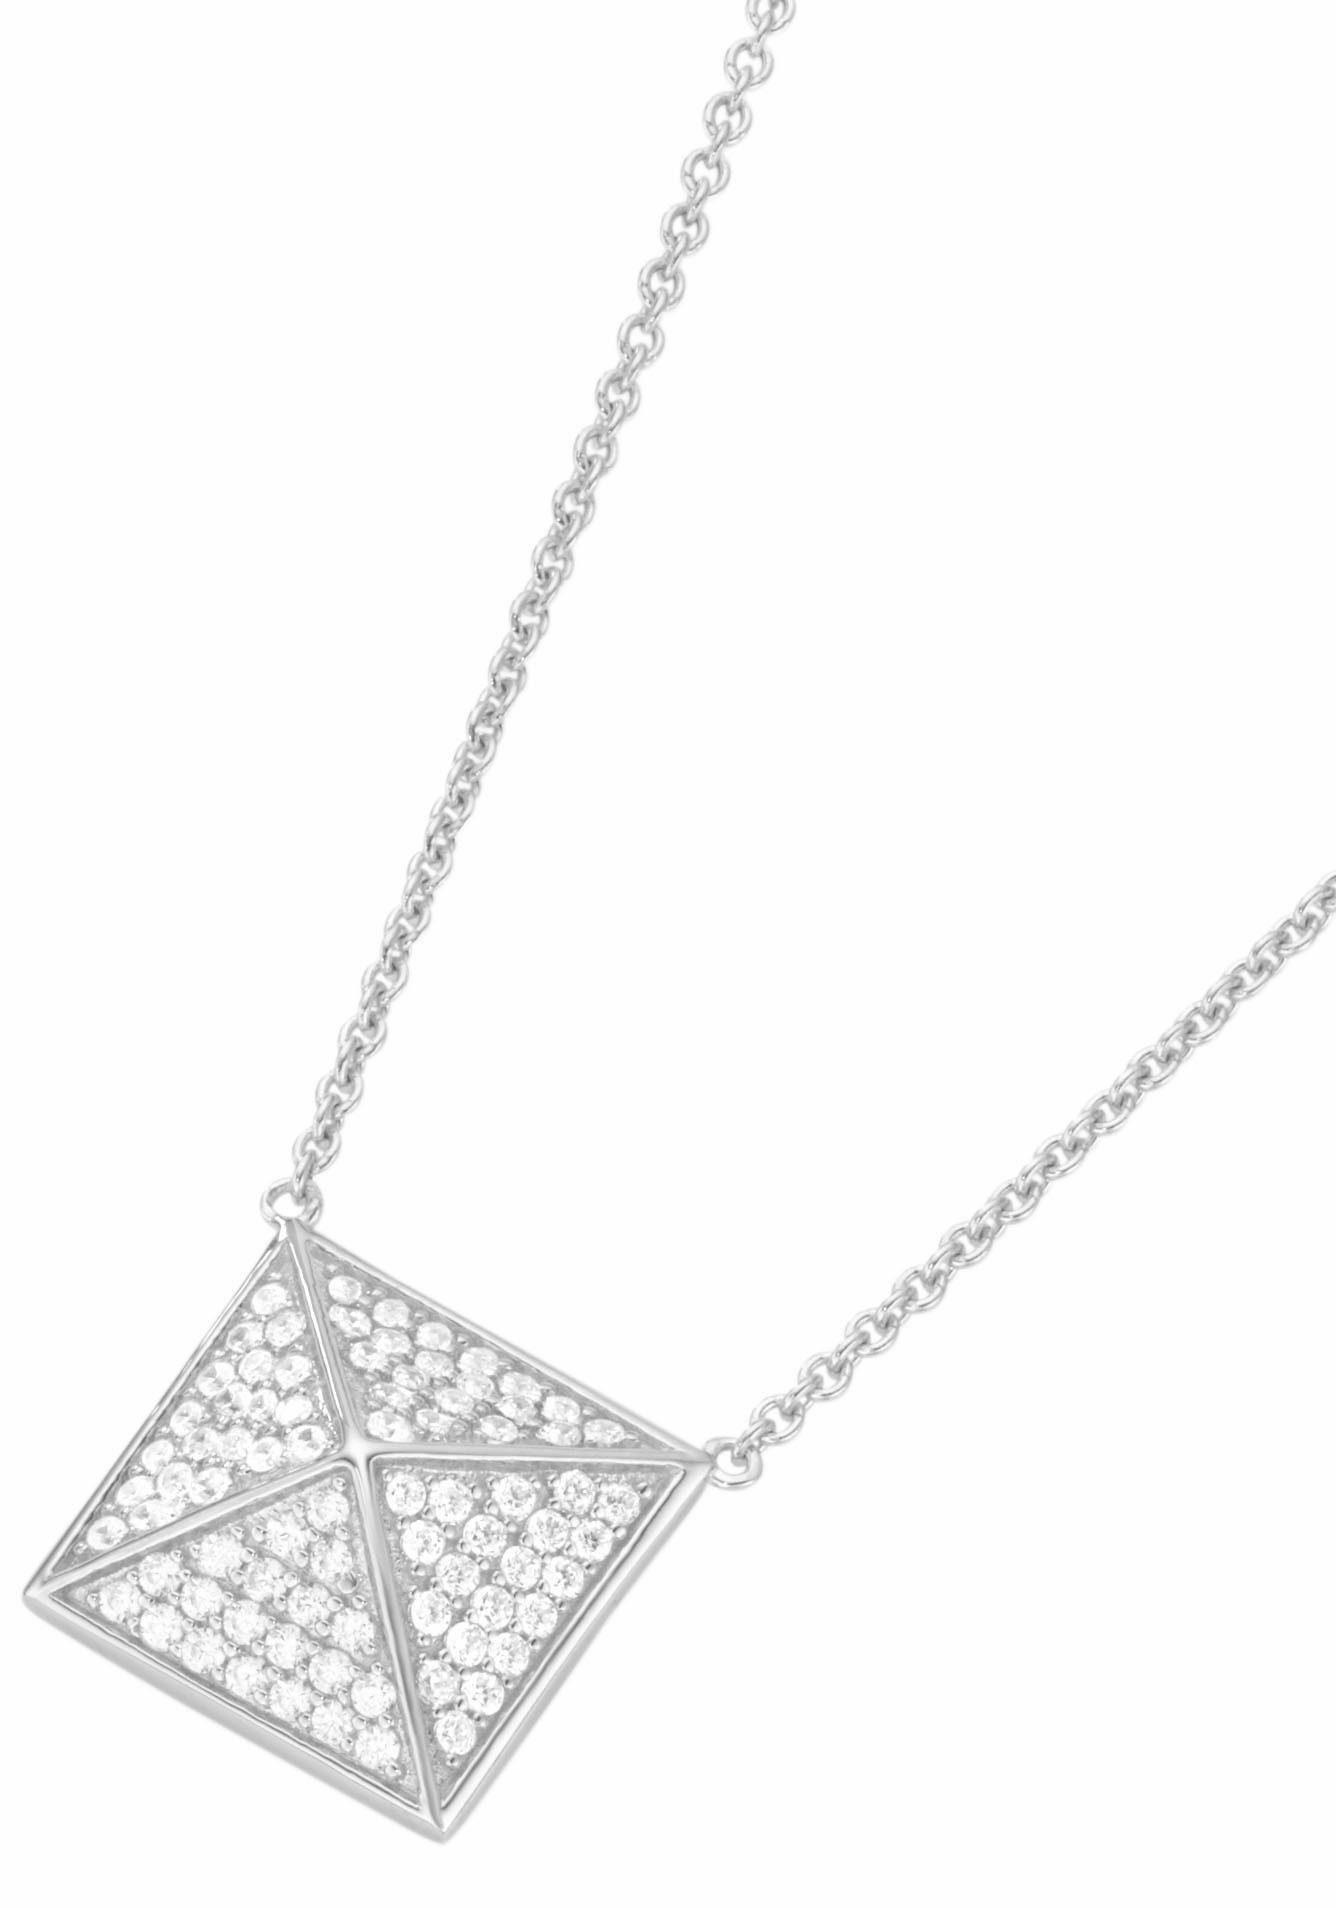 GIORGIO MARTELLO MILANO Silberkette »Pyramide, 195099993450«, mit Zirkonia